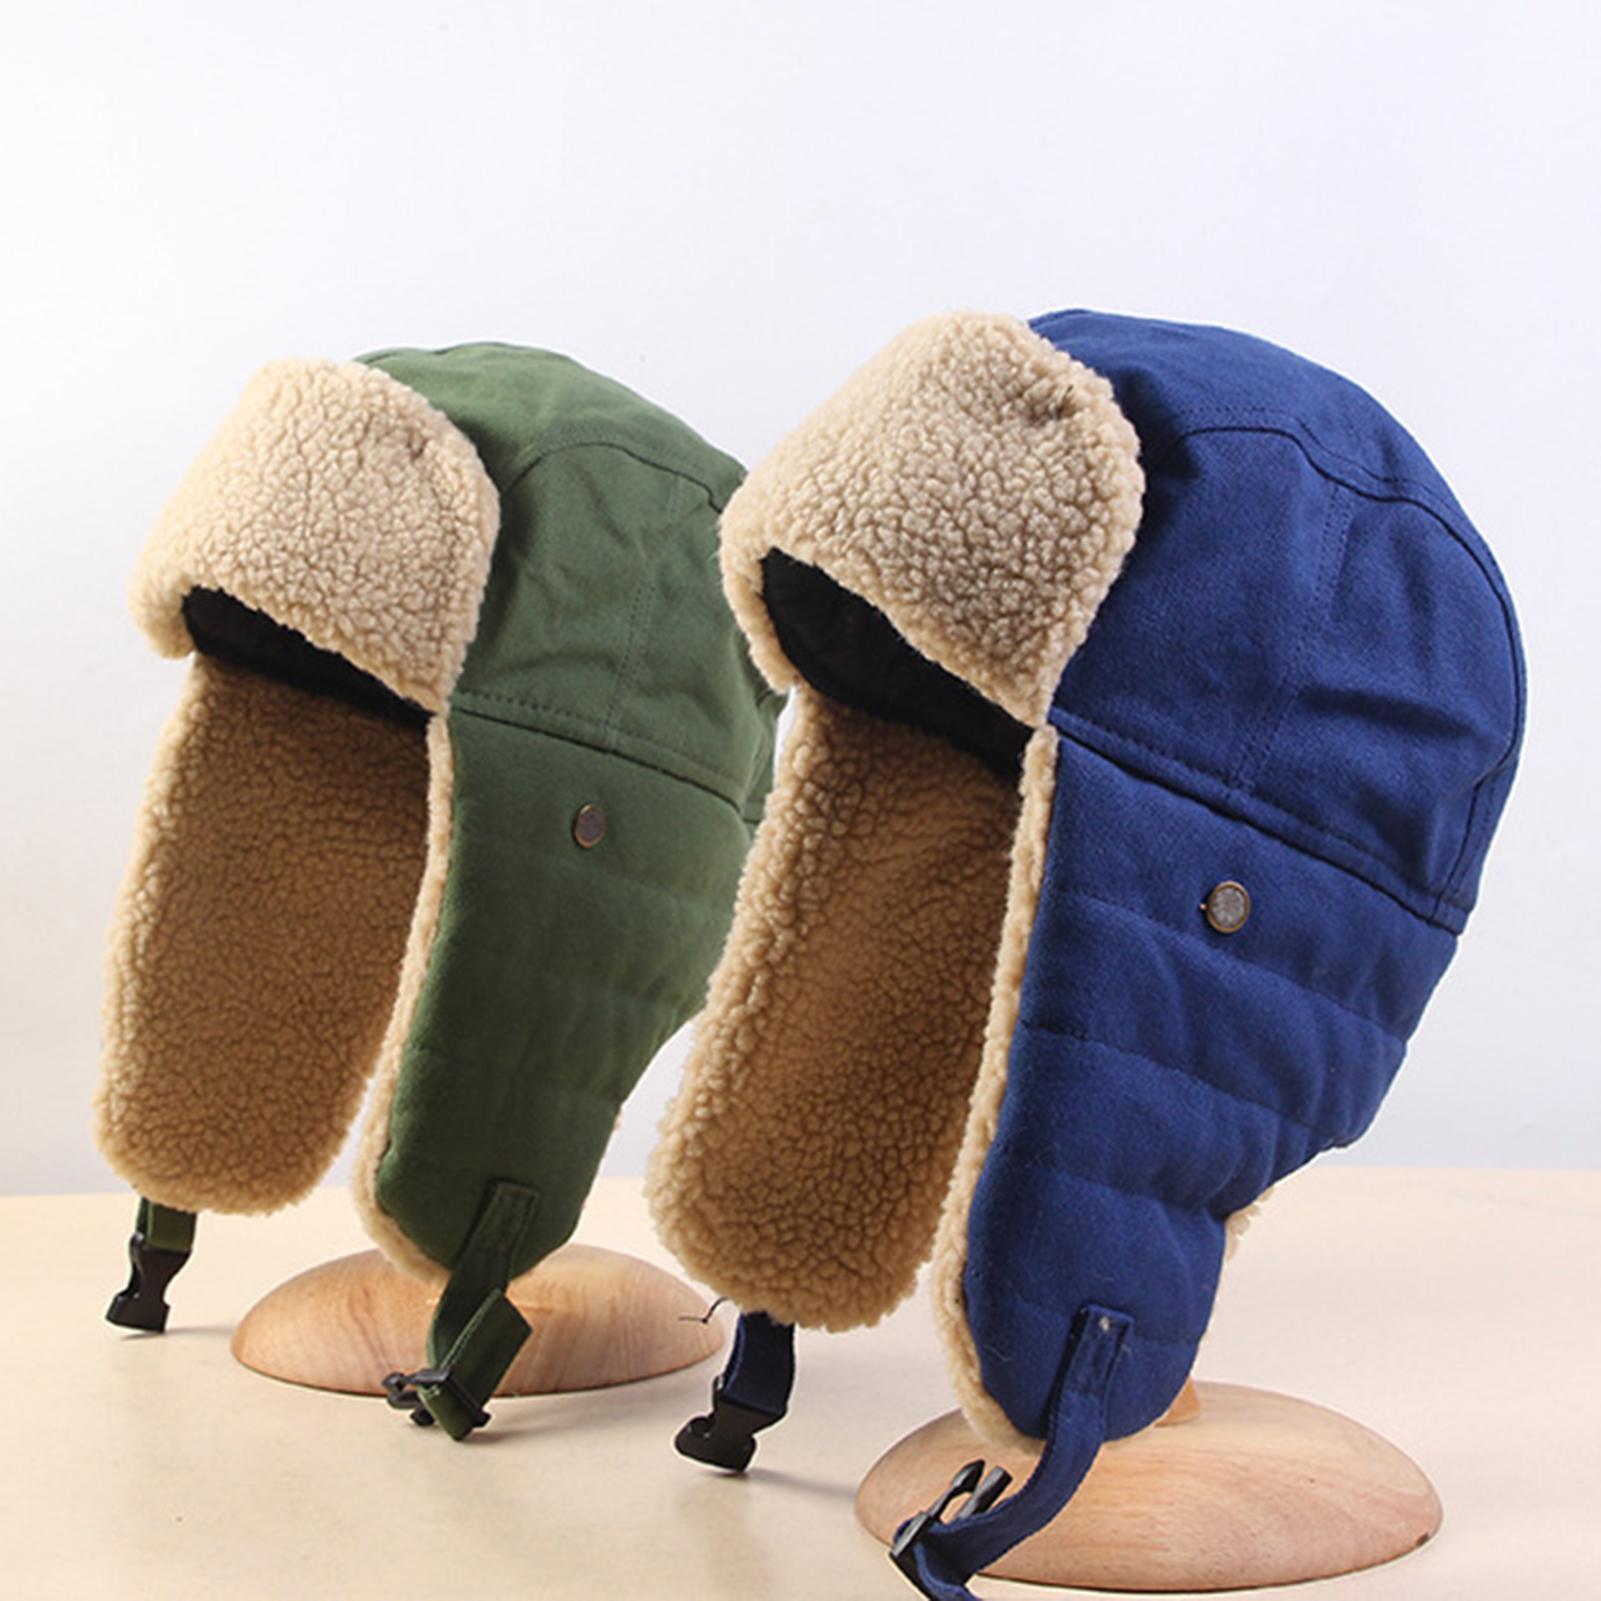 Men Women Winter Cycling Skiing Snow Cotton Hat Windproof Warm Bomber Hat Soft Earflap Cap Winter Sp